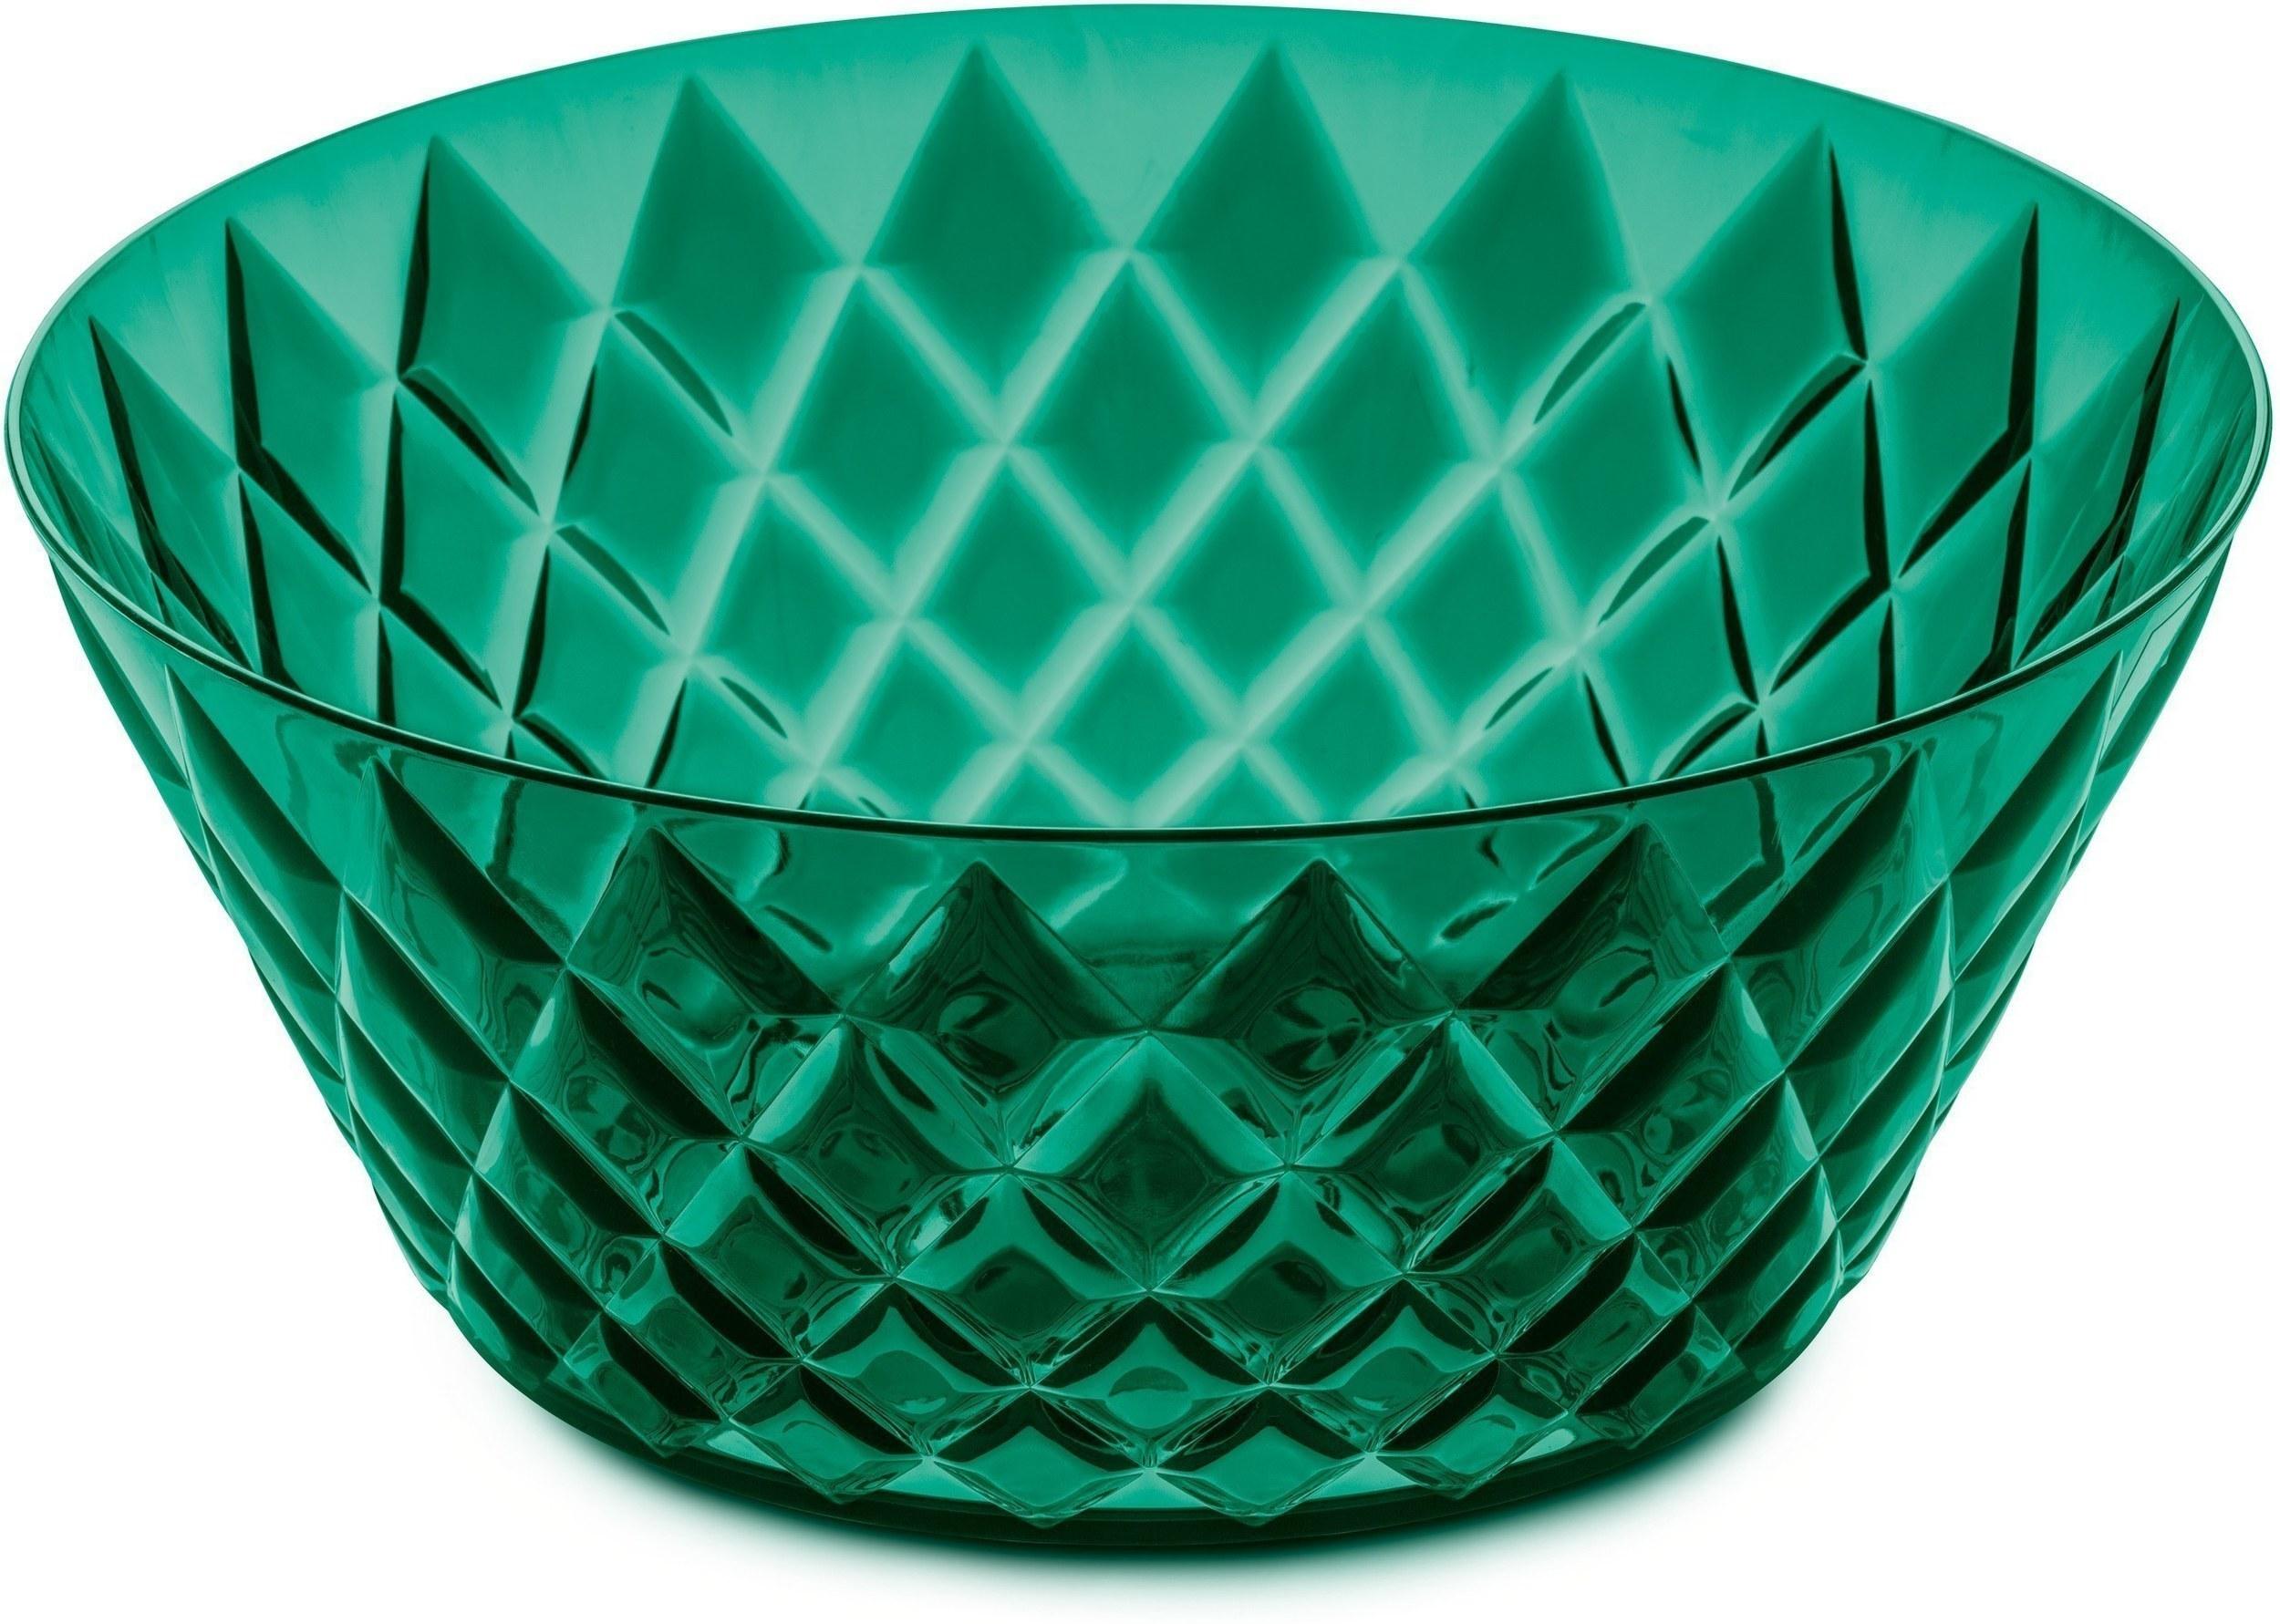 Misa sałatkowa Crystal emerald